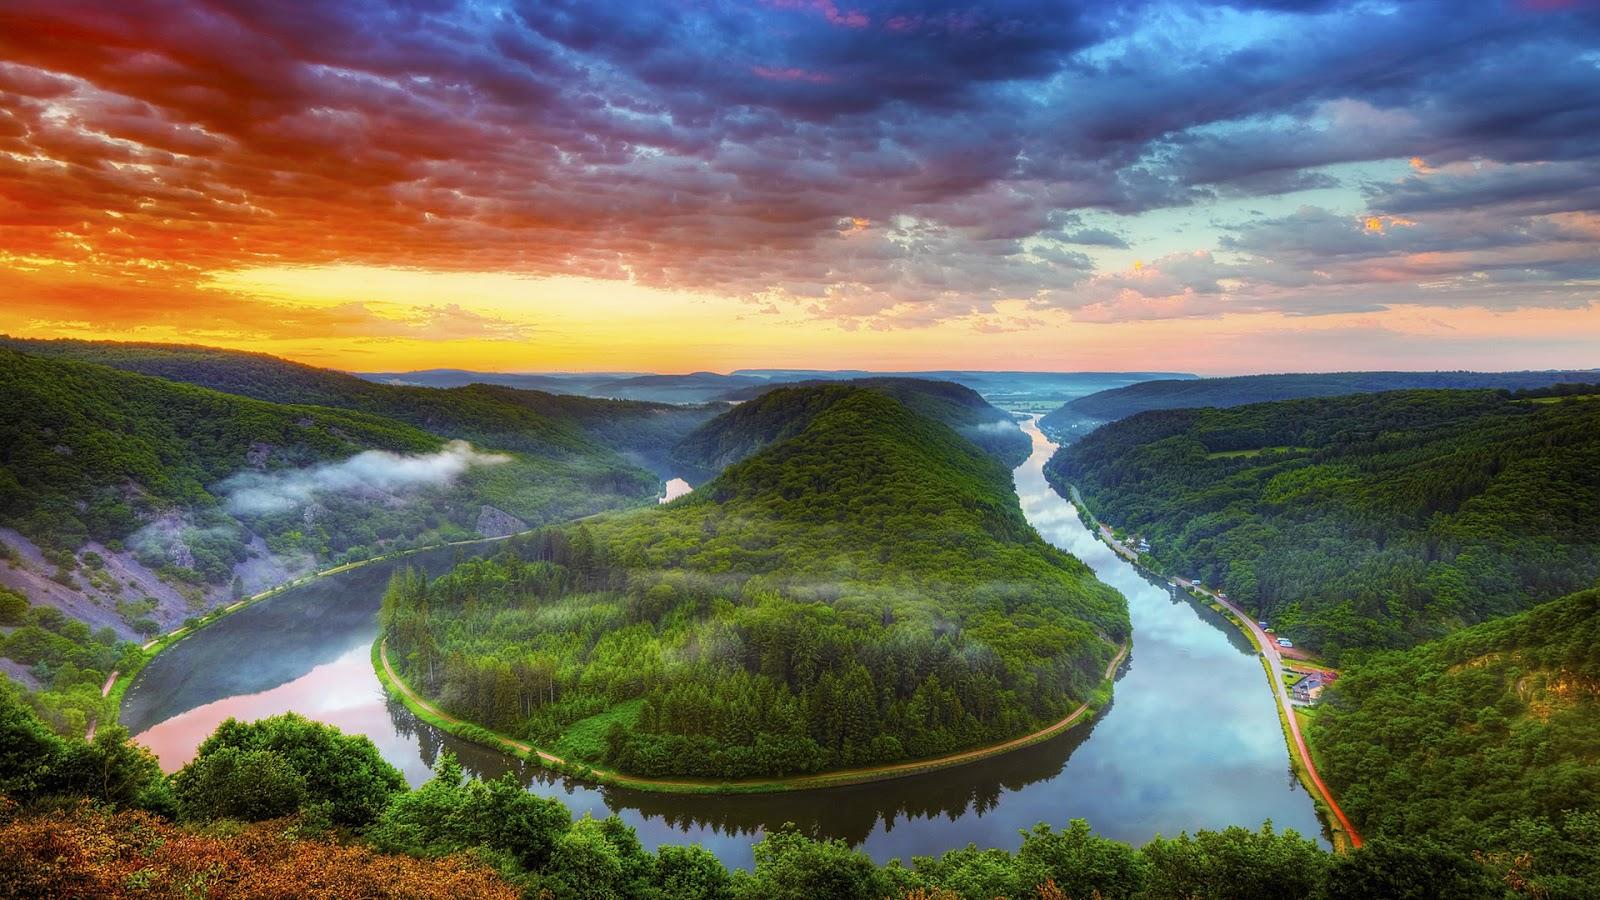 50 1080p Nature Wallpapers Hd For Desktop 2020 We 7